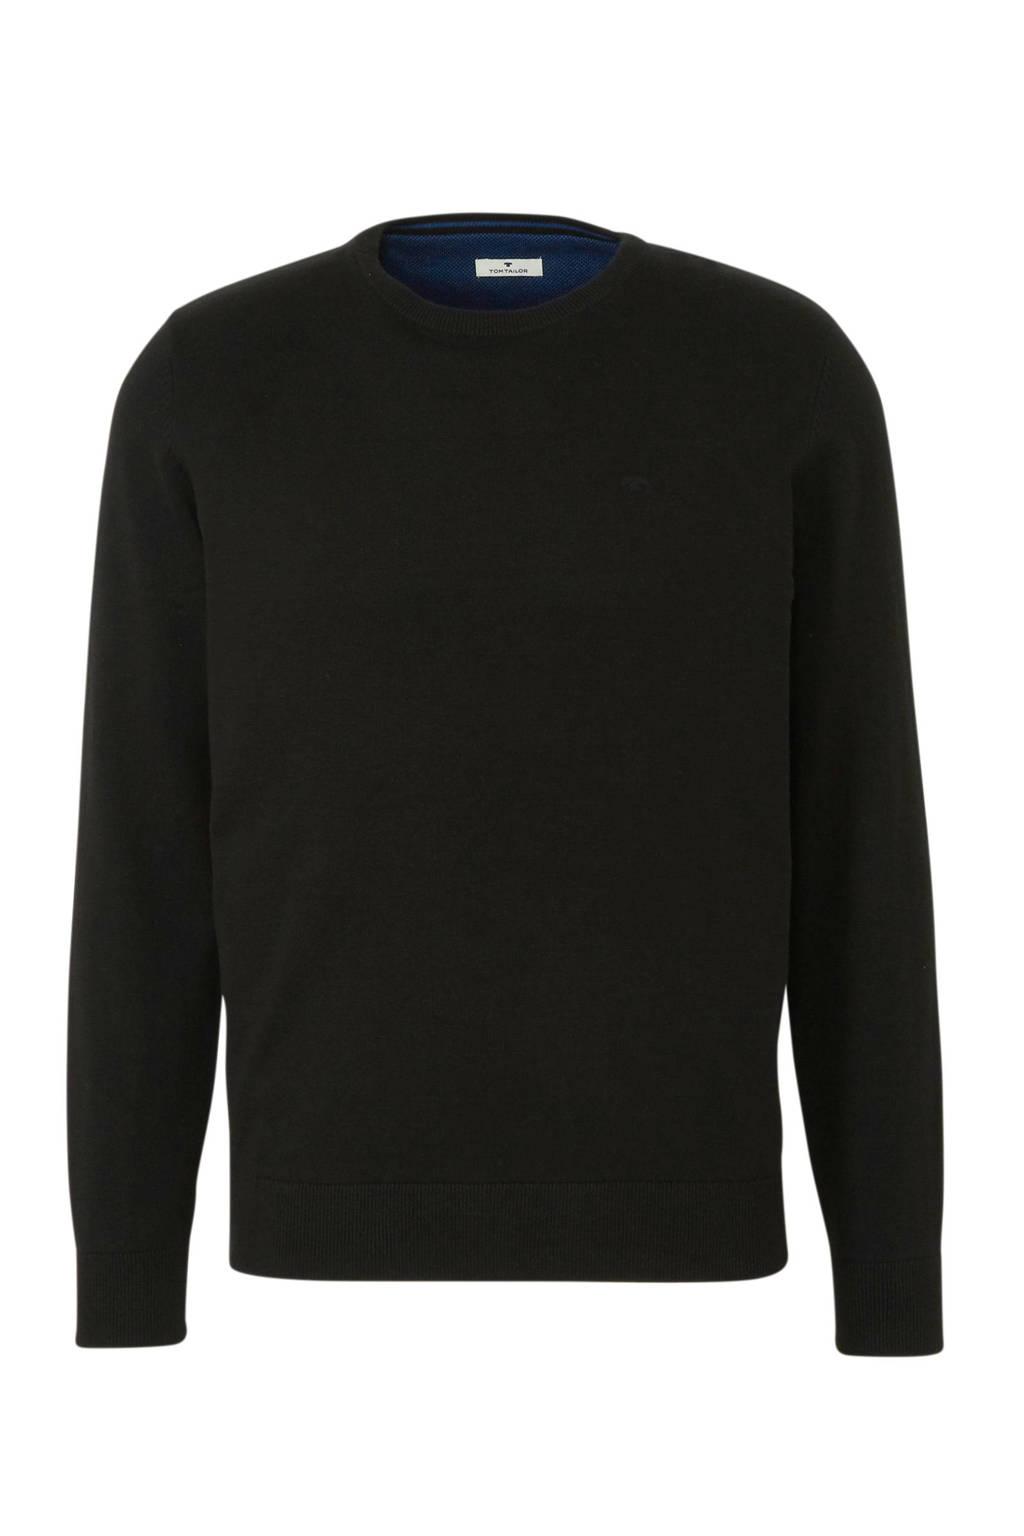 Tom Tailor trui zwart, Zwart